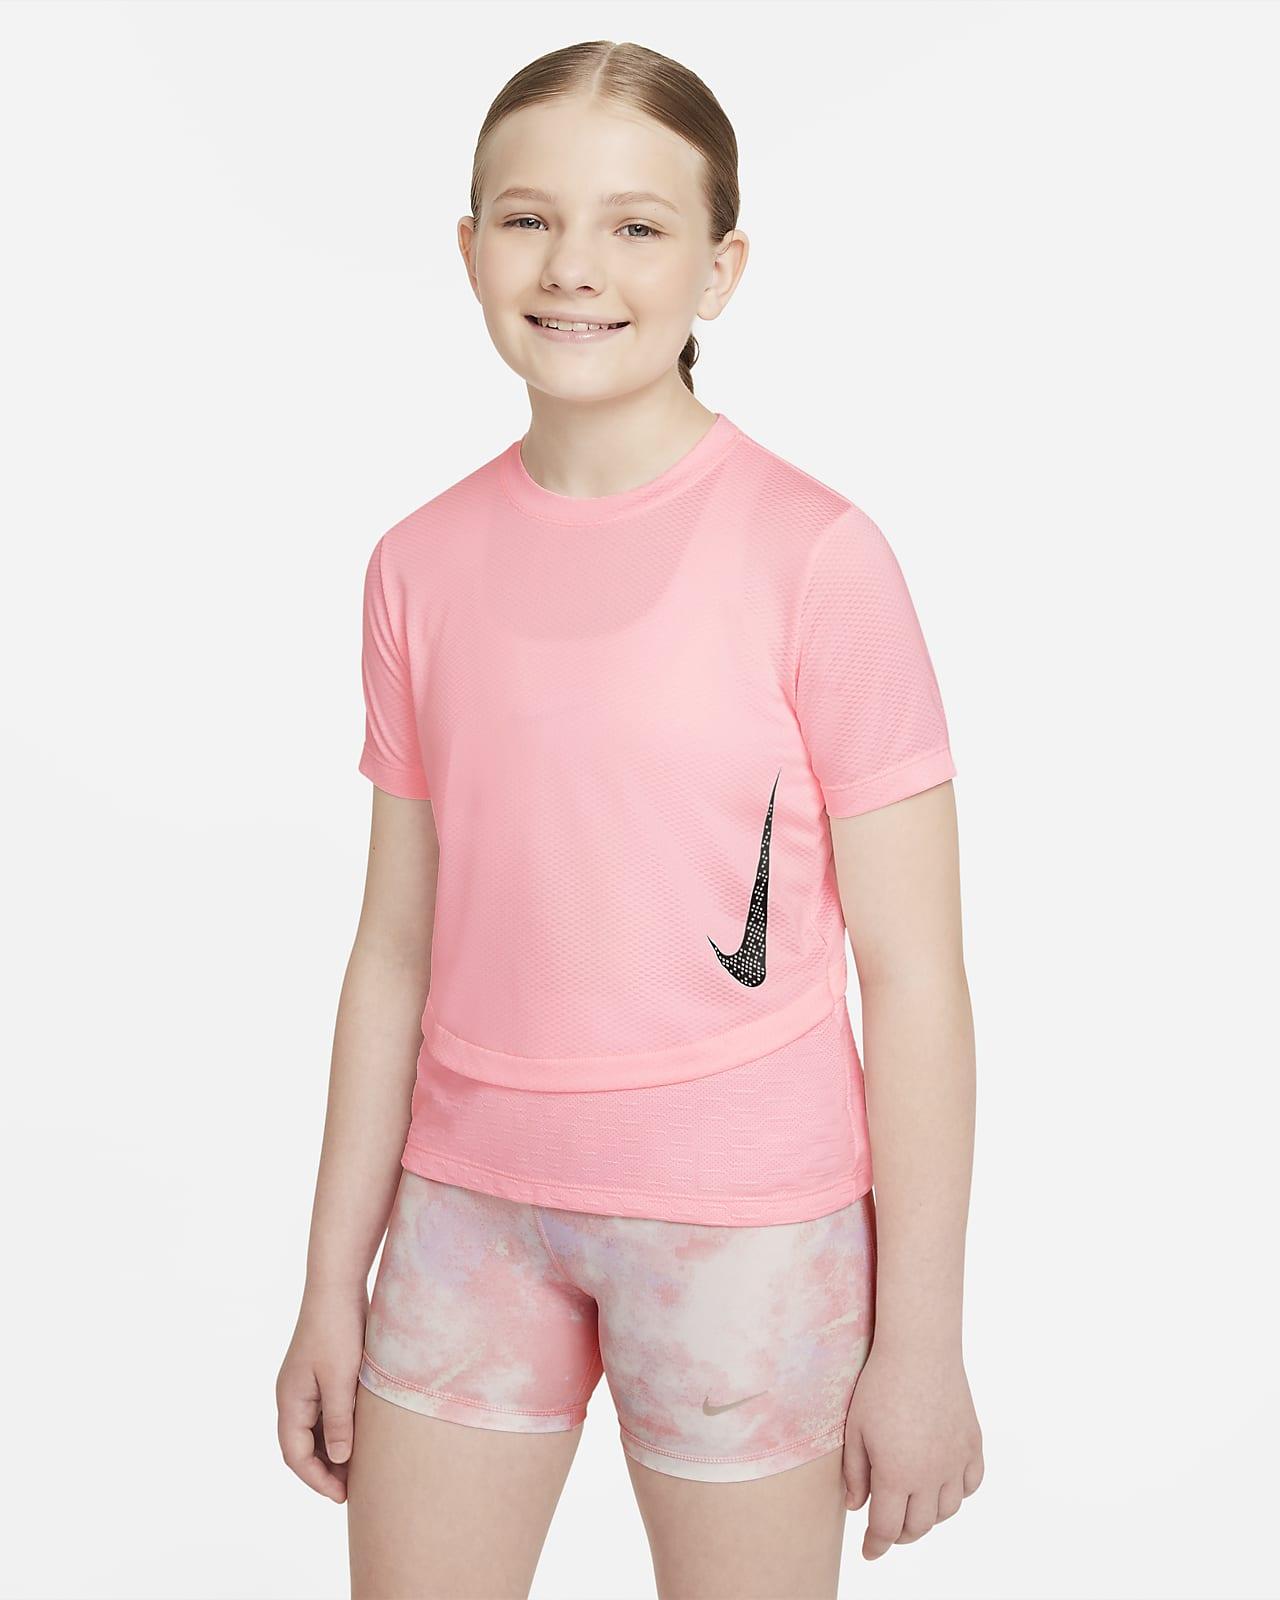 Nike Dri-FIT Instacool Genç Çocuk (Kız) Antrenman Üstü